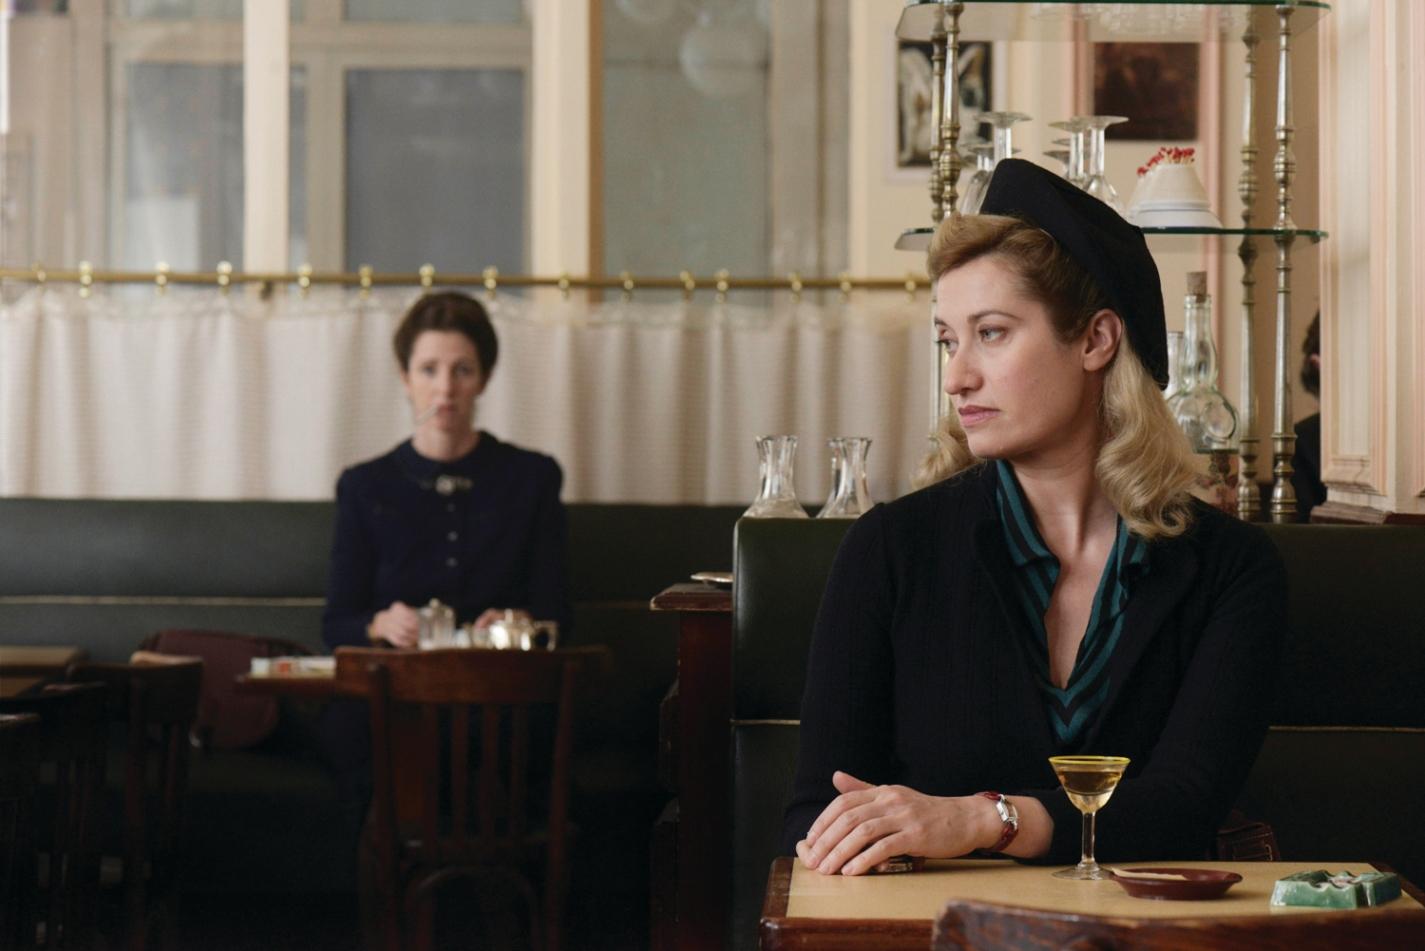 La Casa-Museo Pérez Galdós proyecta la película Violette